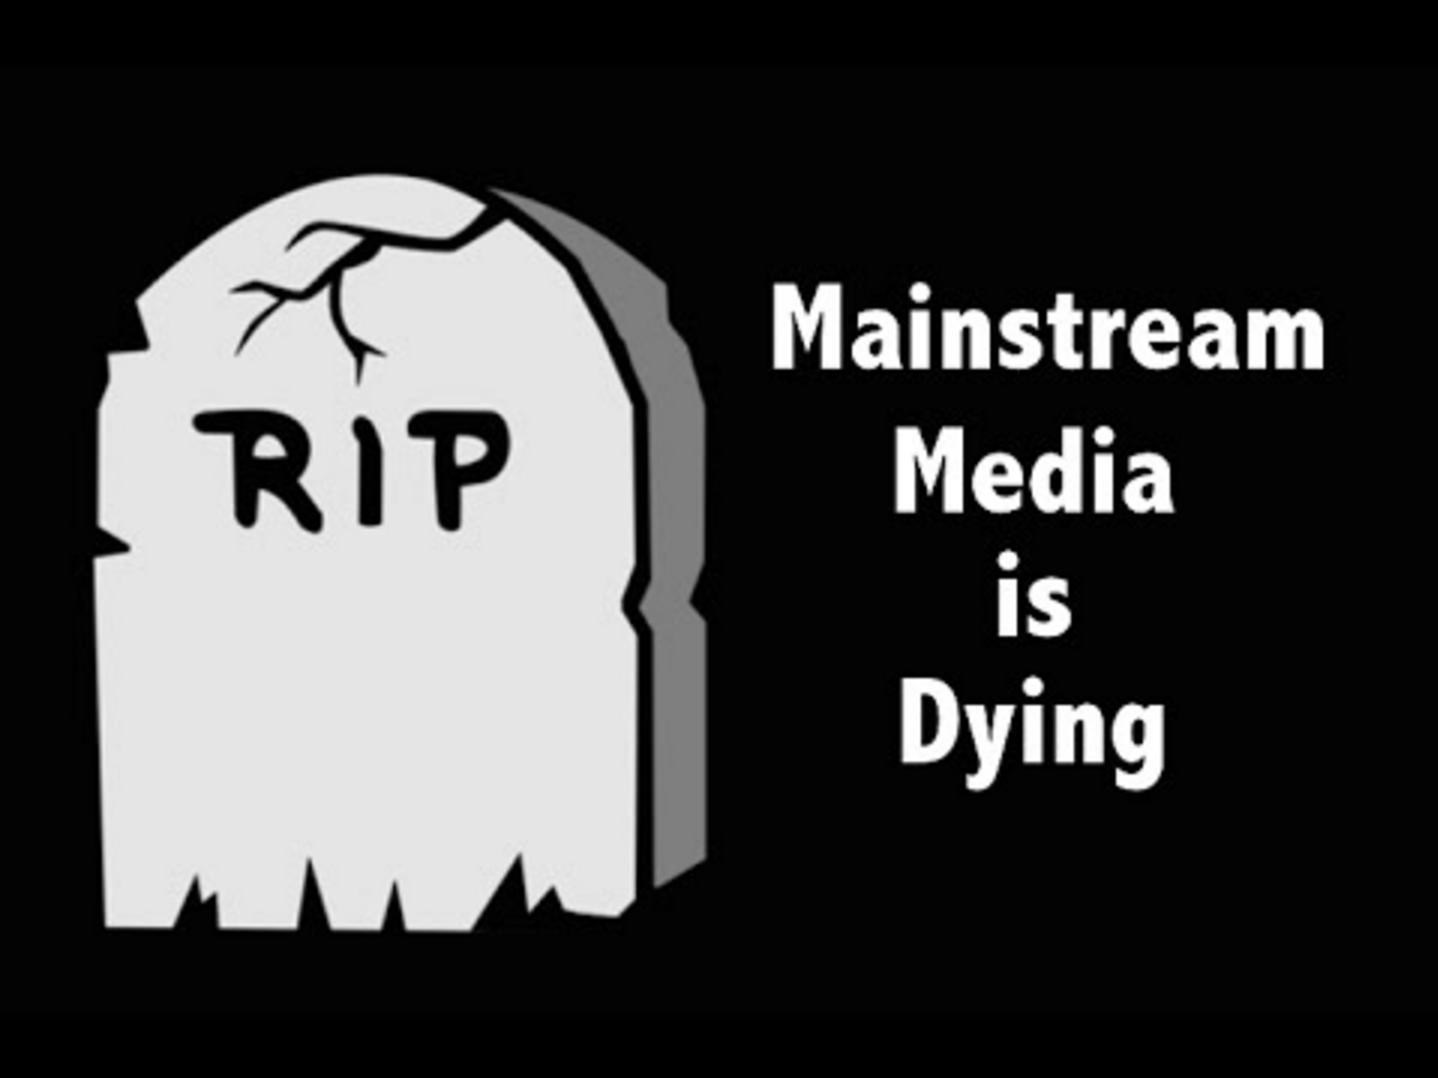 mainstream-media-dying-crimeshop.jpeg